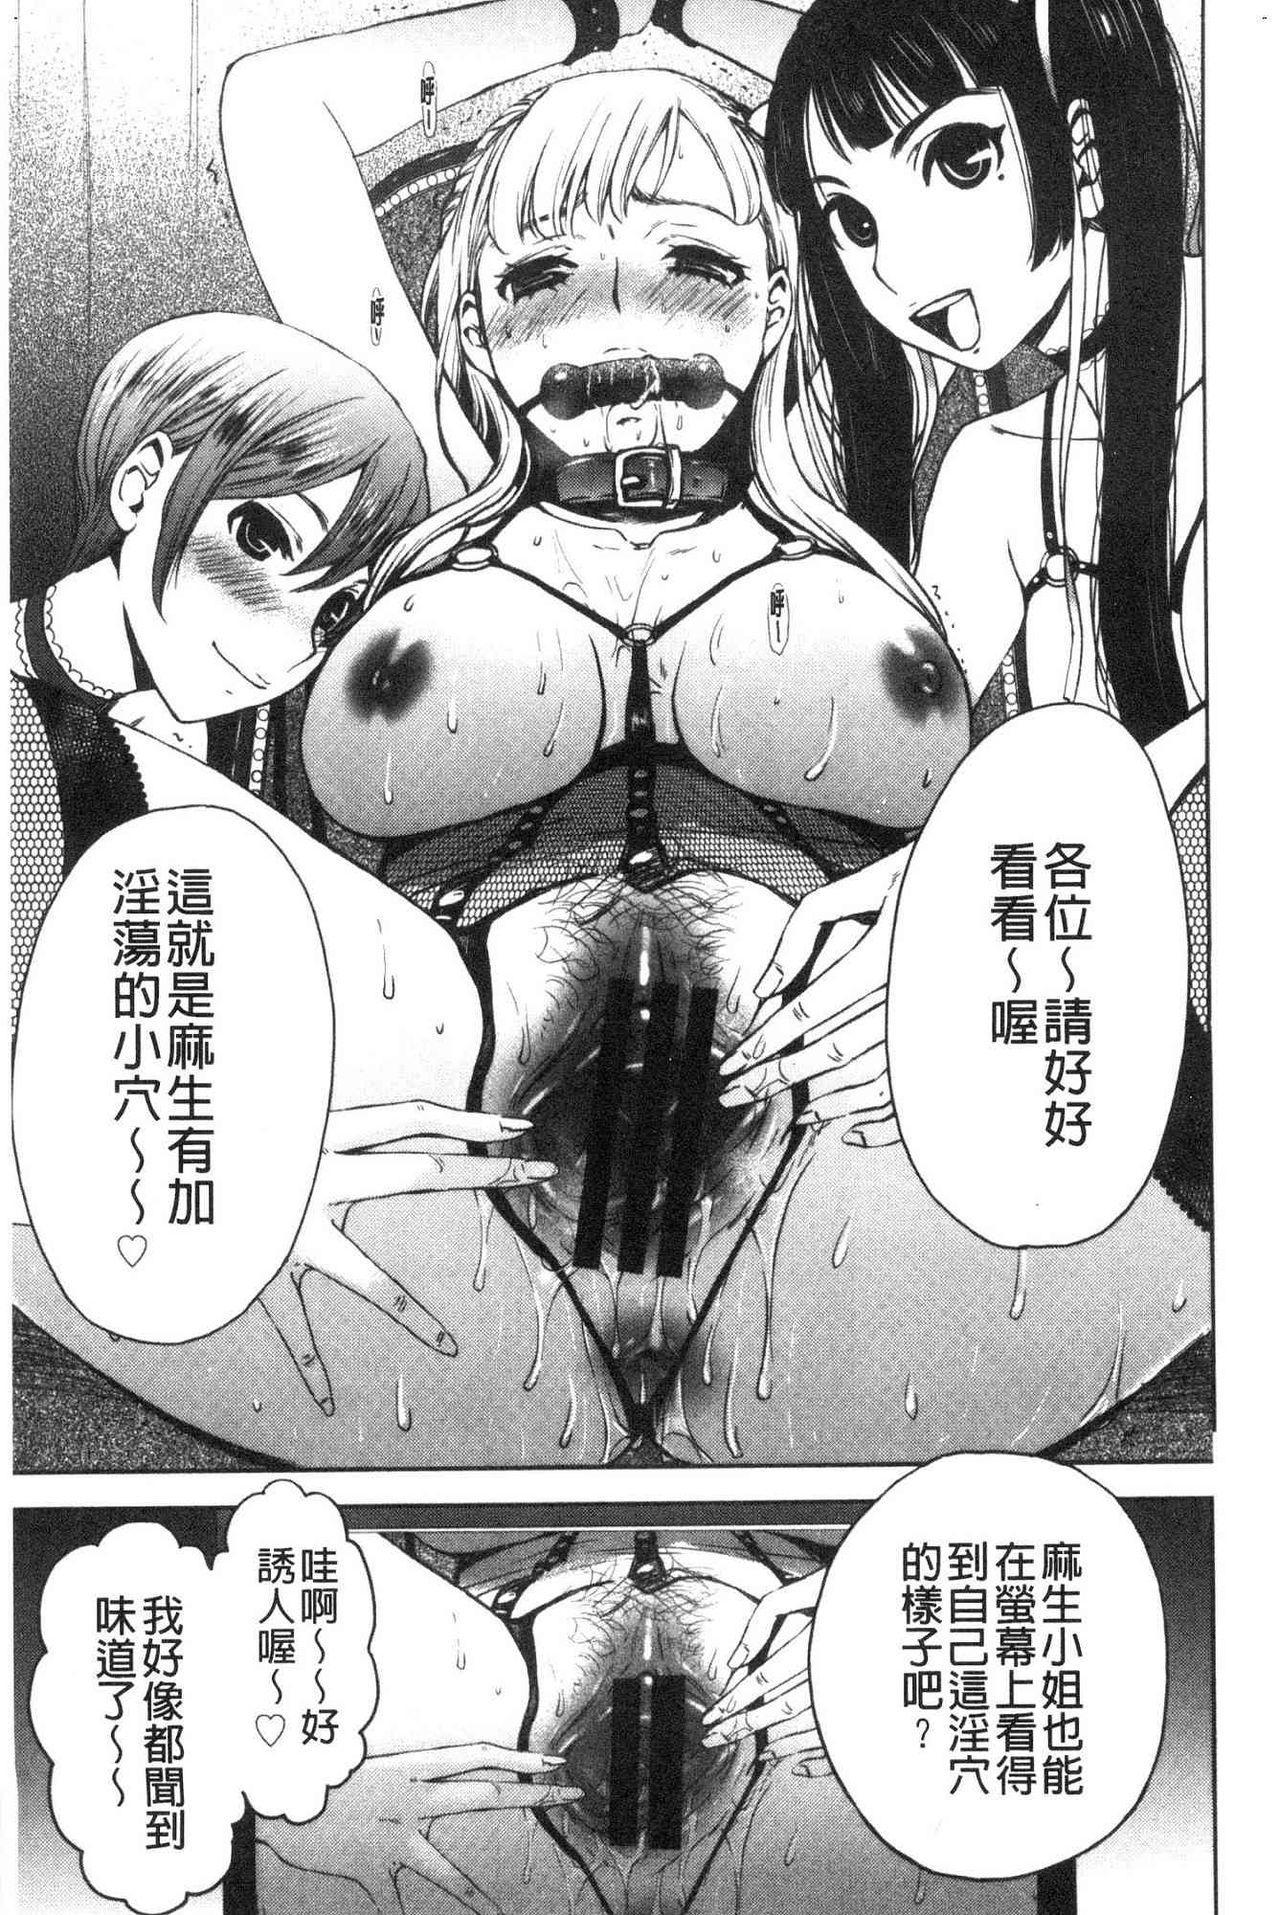 [Gotoh Akira]  21-ji no Onna ~Camera no Mae no Mesuinu~ 2 | 21時之女 ~鏡頭前的牝犬~ 2 [Chinese] 122